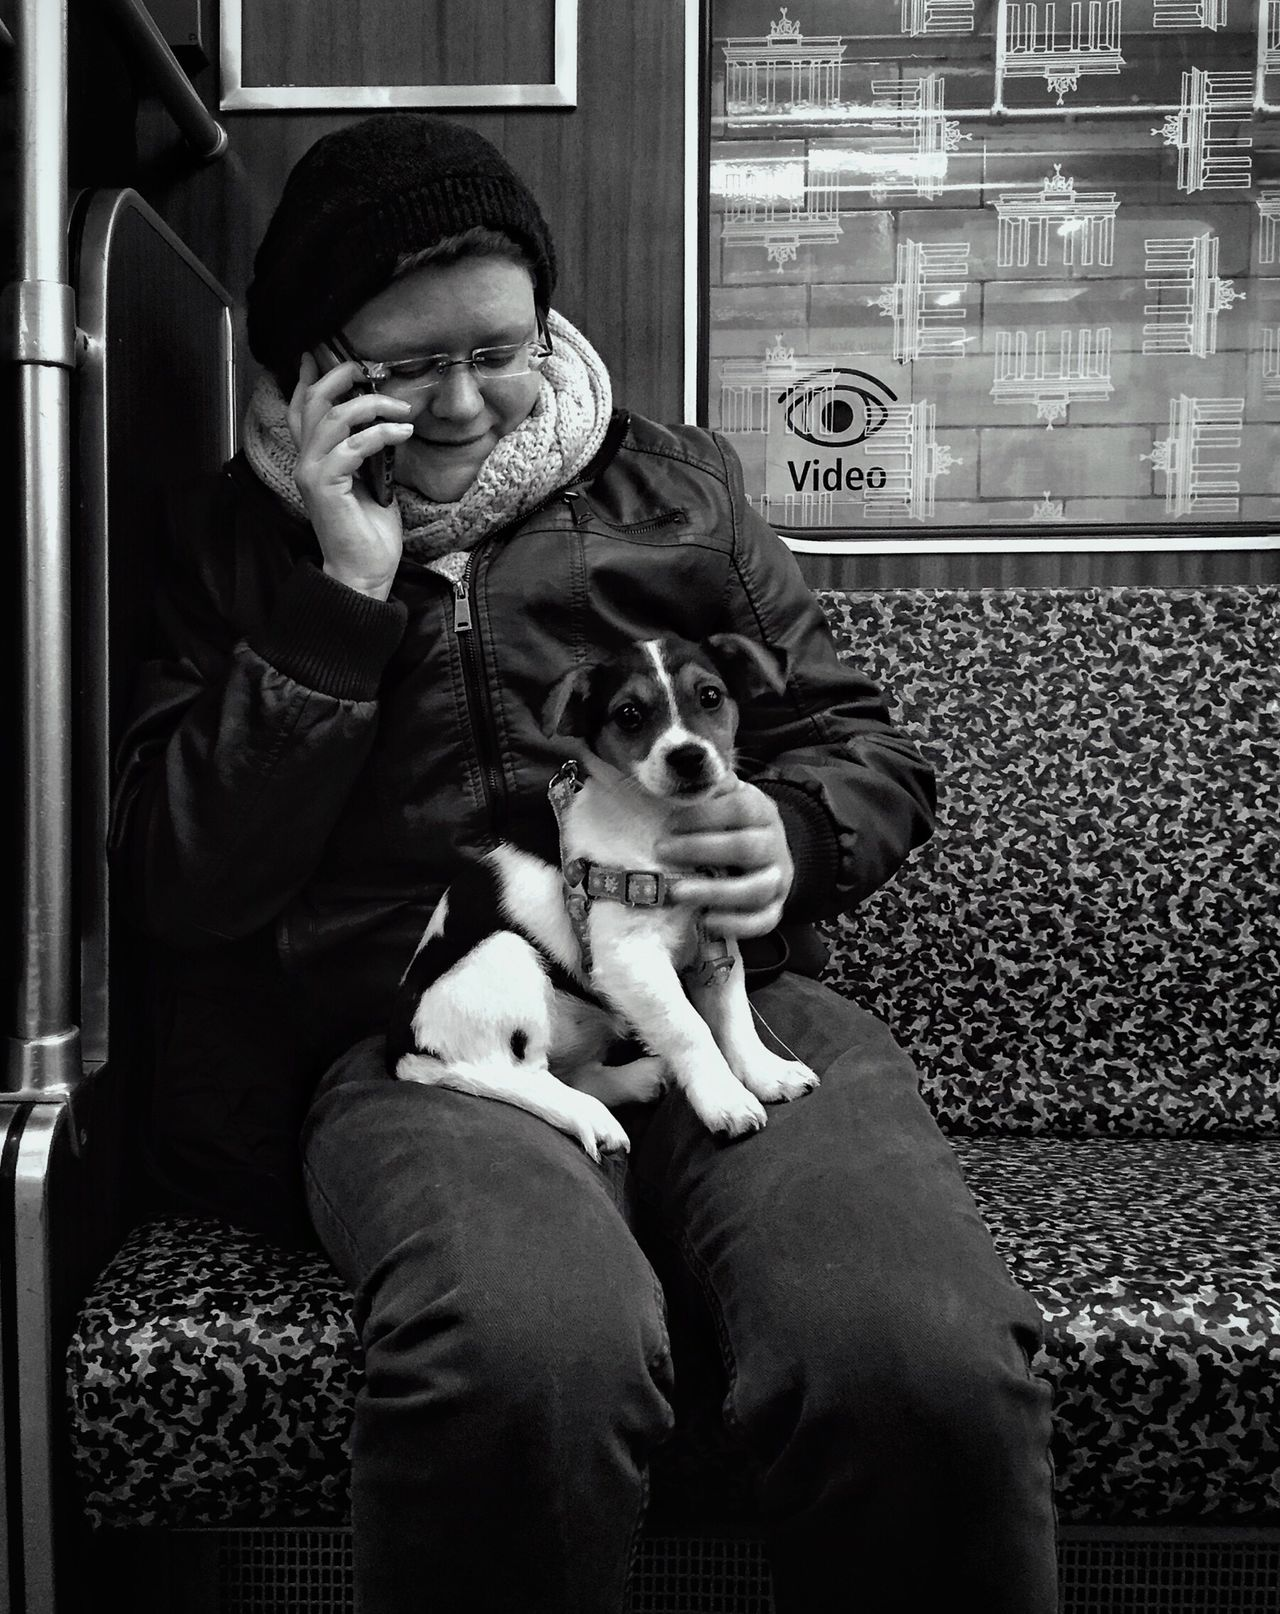 StreetPortraits Streetphotography Public Transportation Berlin Myfuckingberlin Blackandwhite Bnw Mpro Iphone6 Mobilephotography